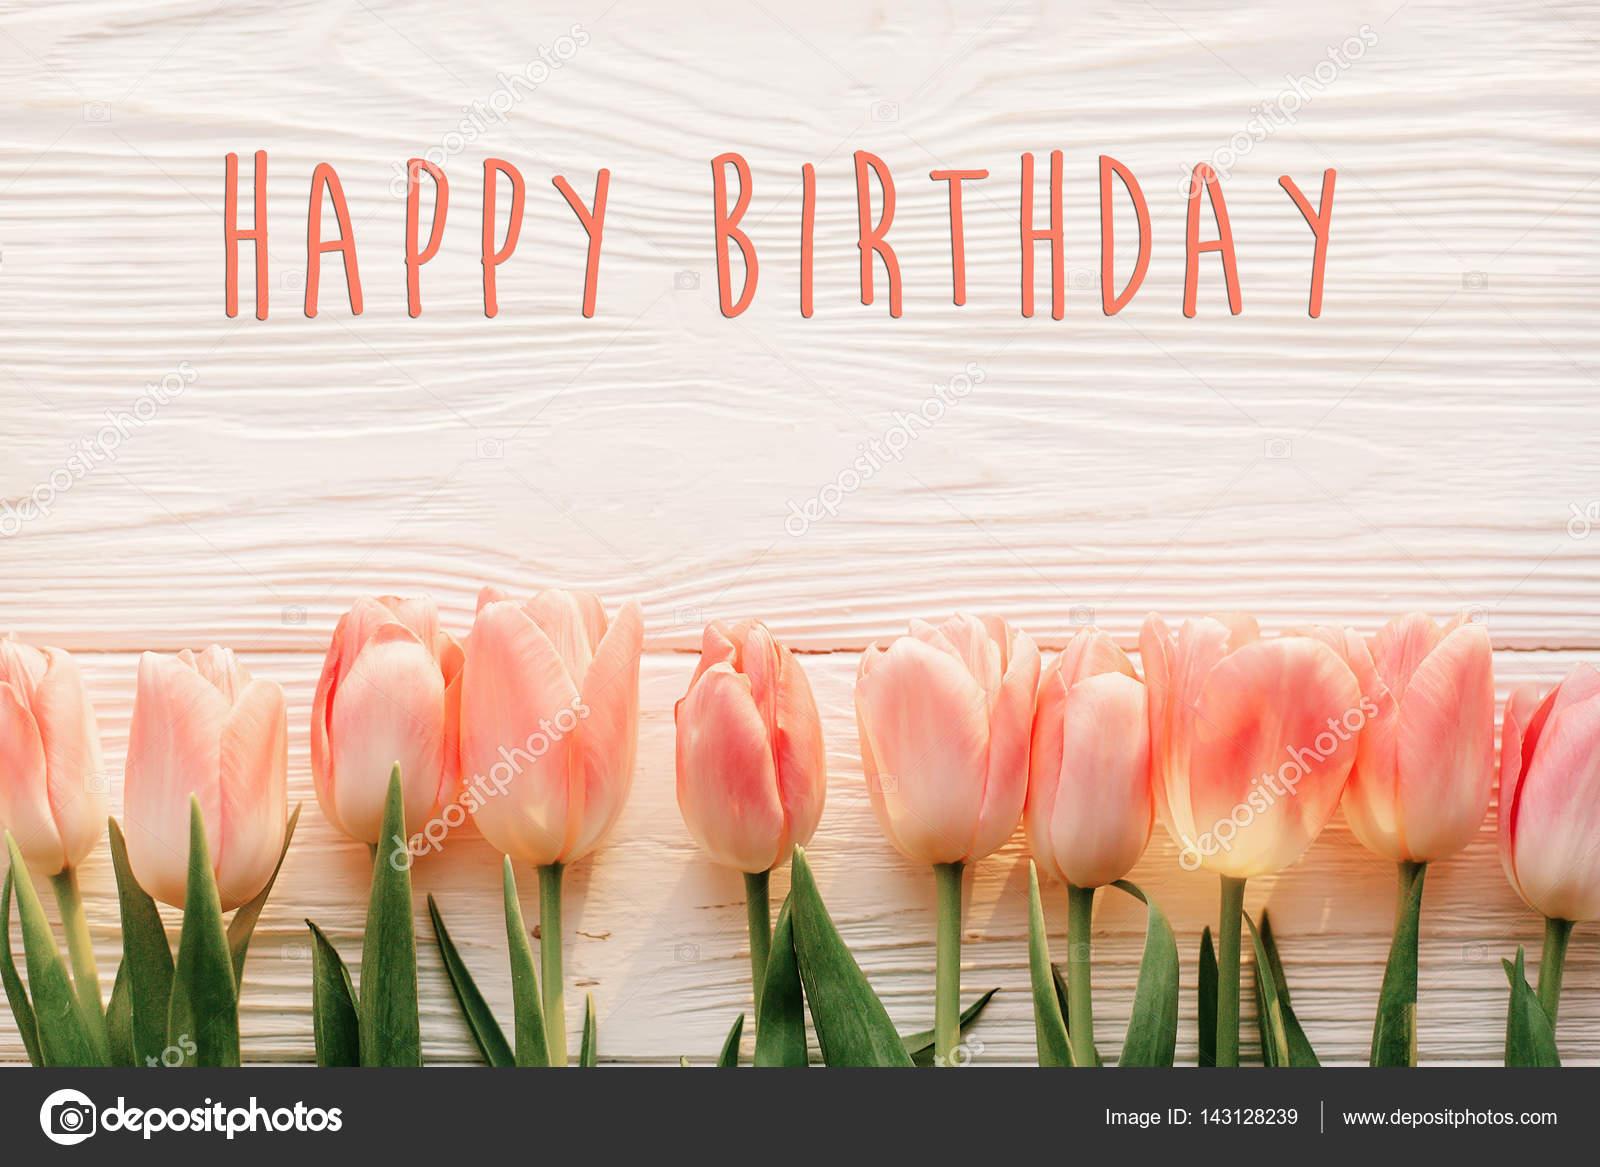 beautiful happy birthday flowers images